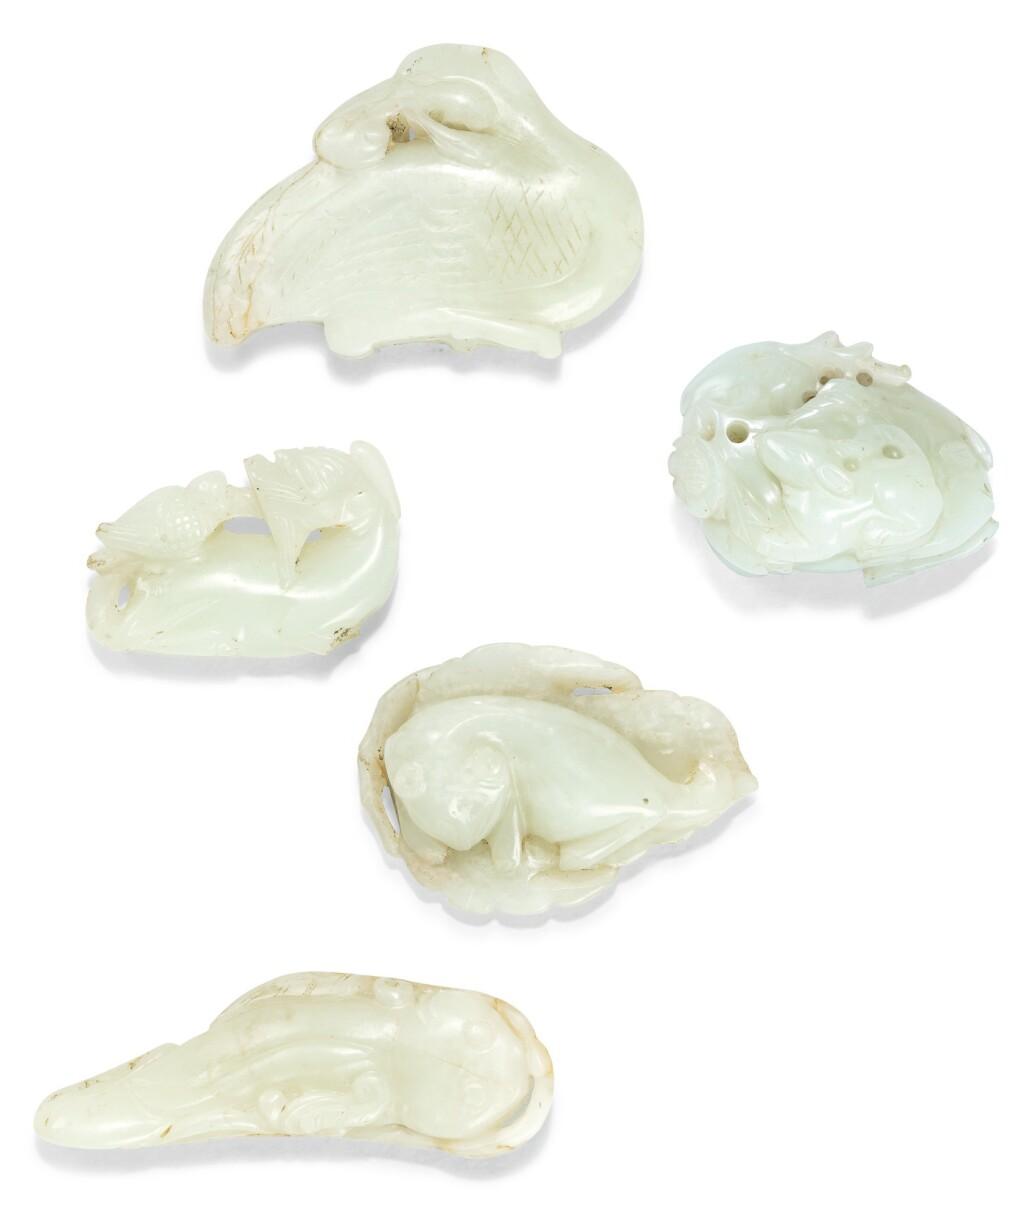 CINQ GROUPES EN JADE BLANC ET CÉLADON DYNASTIE QING, XVIIE-XVIIIE SIÈCLE | 清十七至十八世紀 青白玉及翠玉器一組七件 | A group of five jade carvings, Qing Dynasty, 17th/18th century